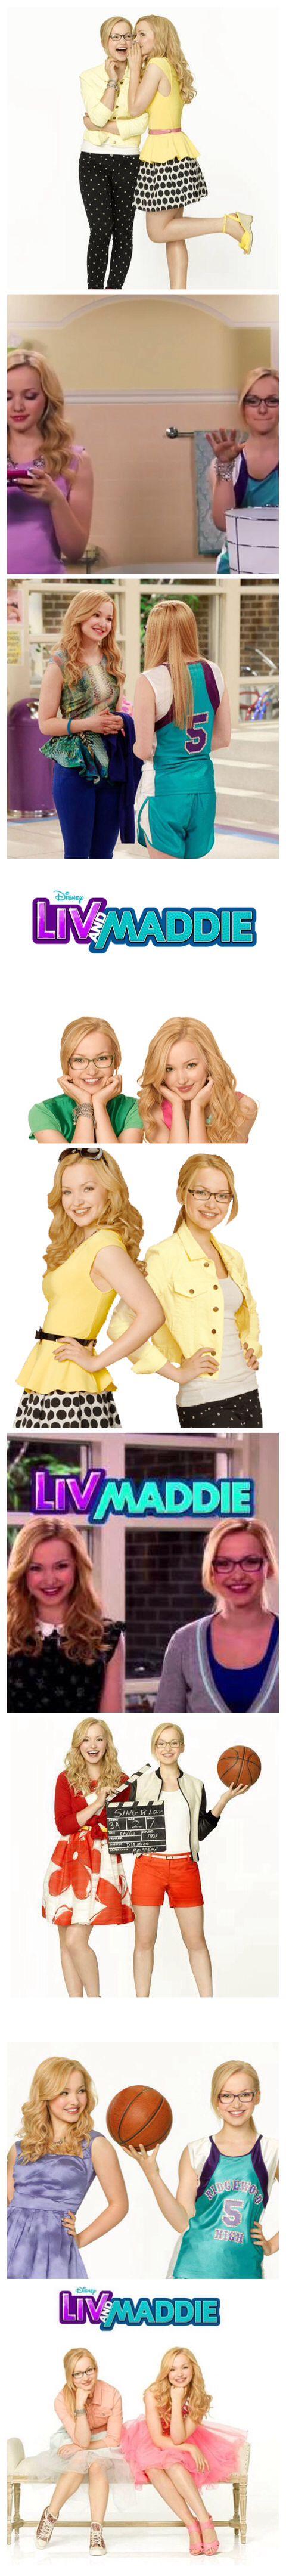 Liv and Maddie photo strip